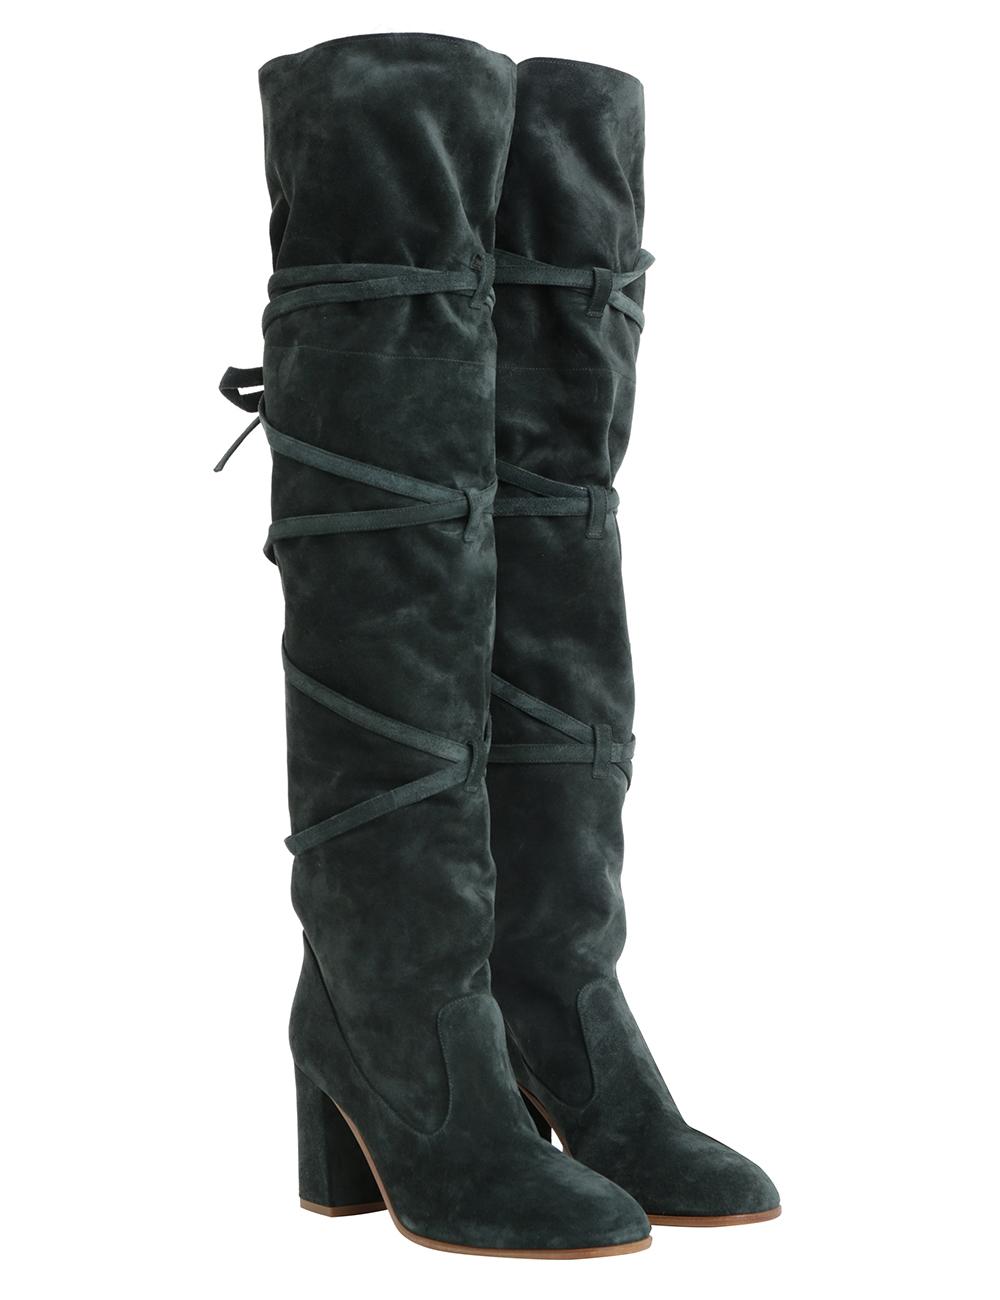 863fa111fa1 Shop Women's Designer Boots Online | ZIMMERMANN